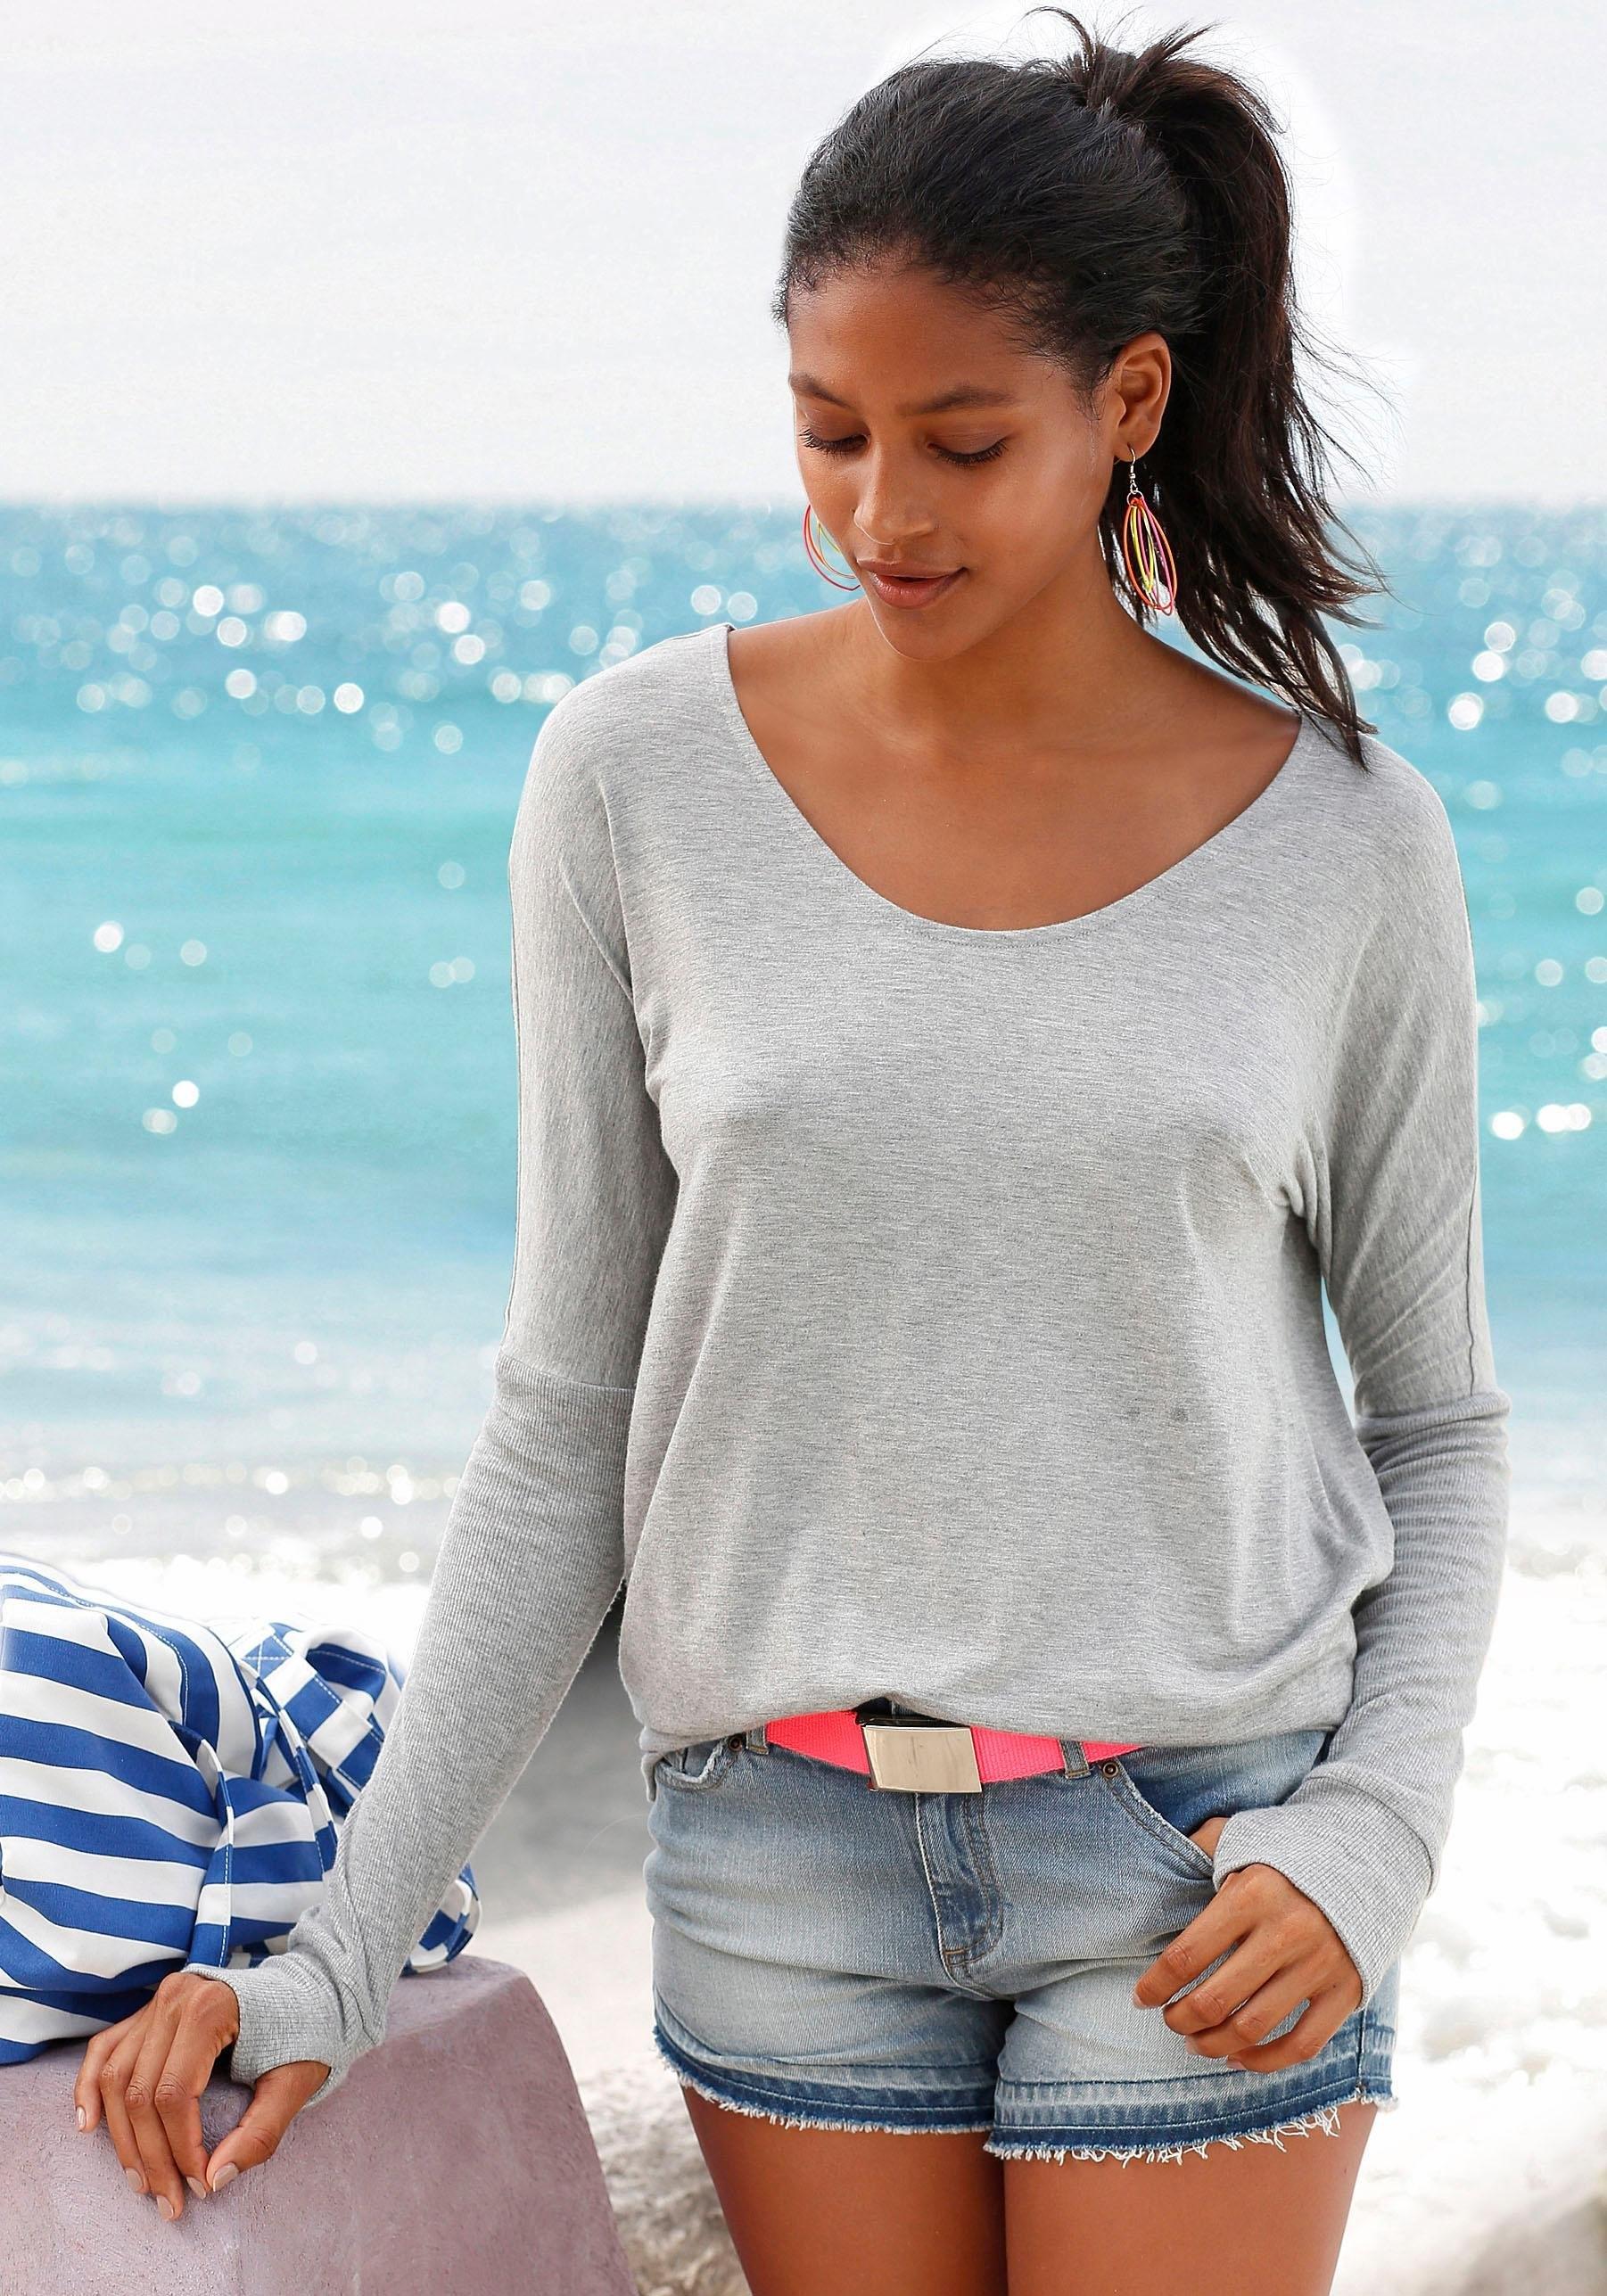 Met Ruglijn Lage Strandshirt Bestellen Bench Online qzVUGSMp